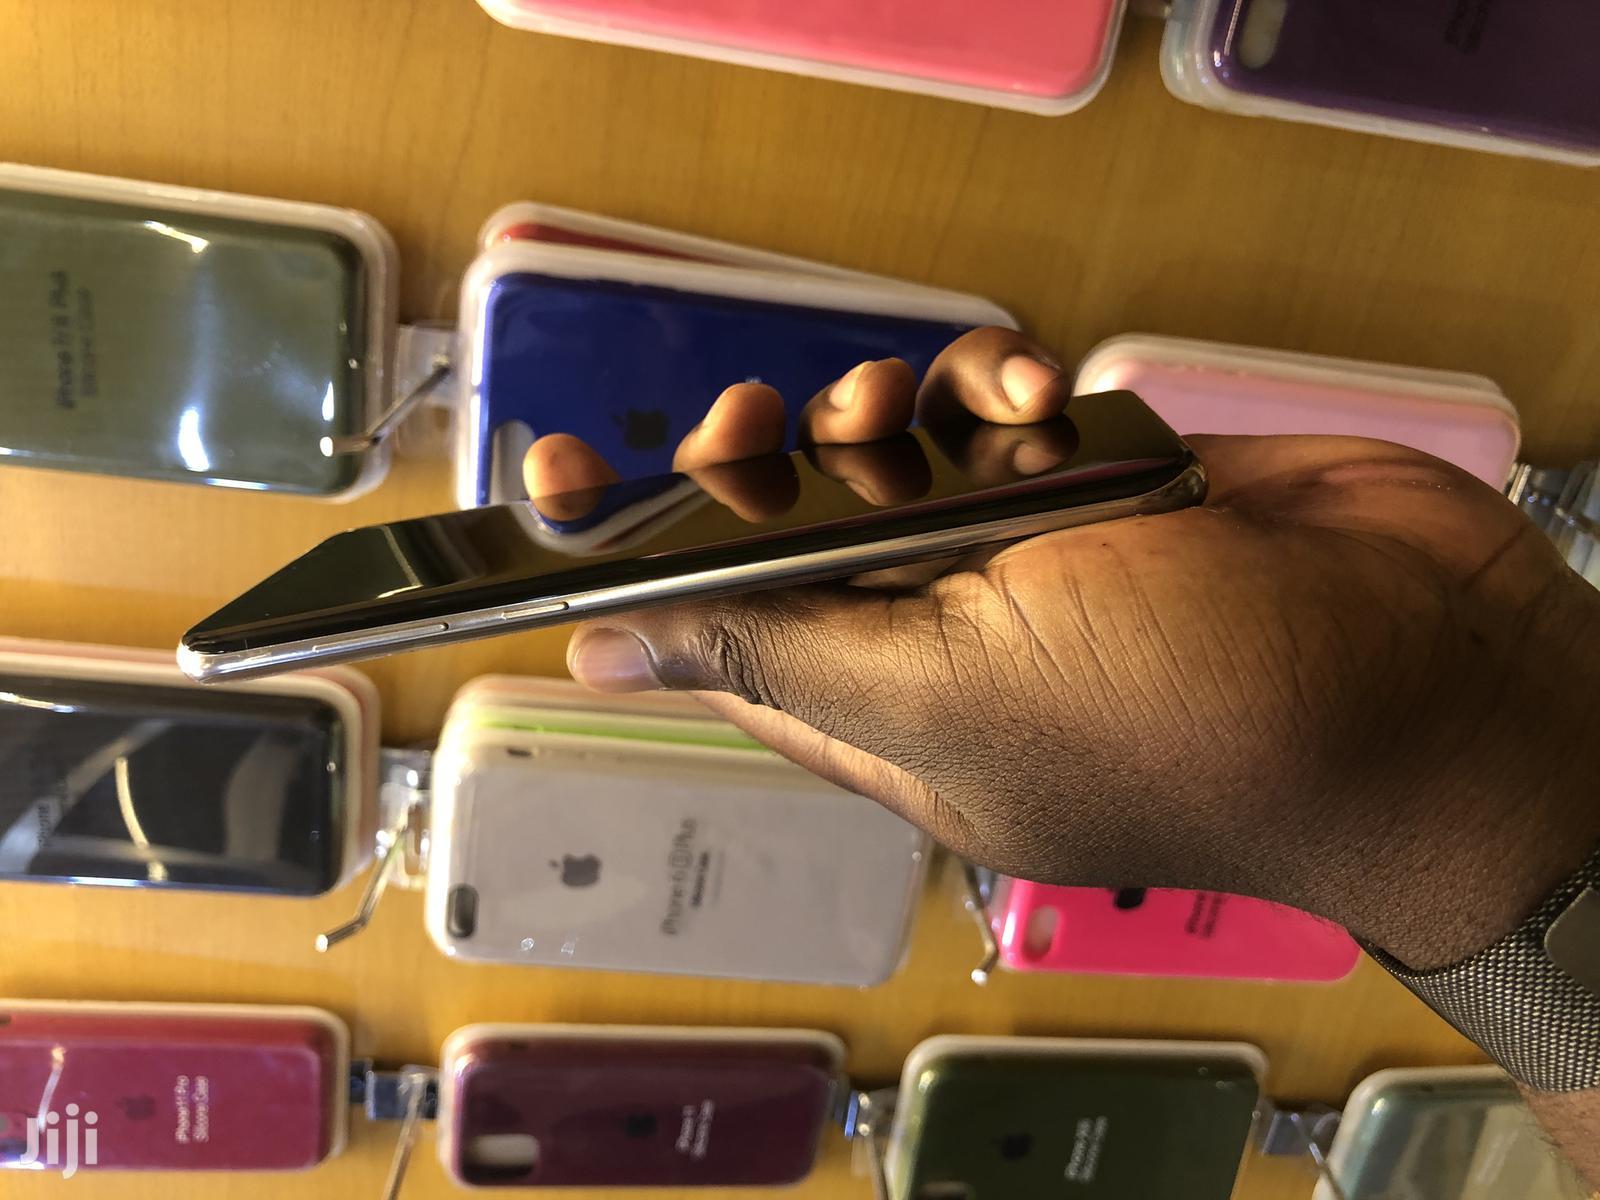 Samsung Galaxy S8 Plus 64 GB Gold   Mobile Phones for sale in Kinondoni, Dar es Salaam, Tanzania